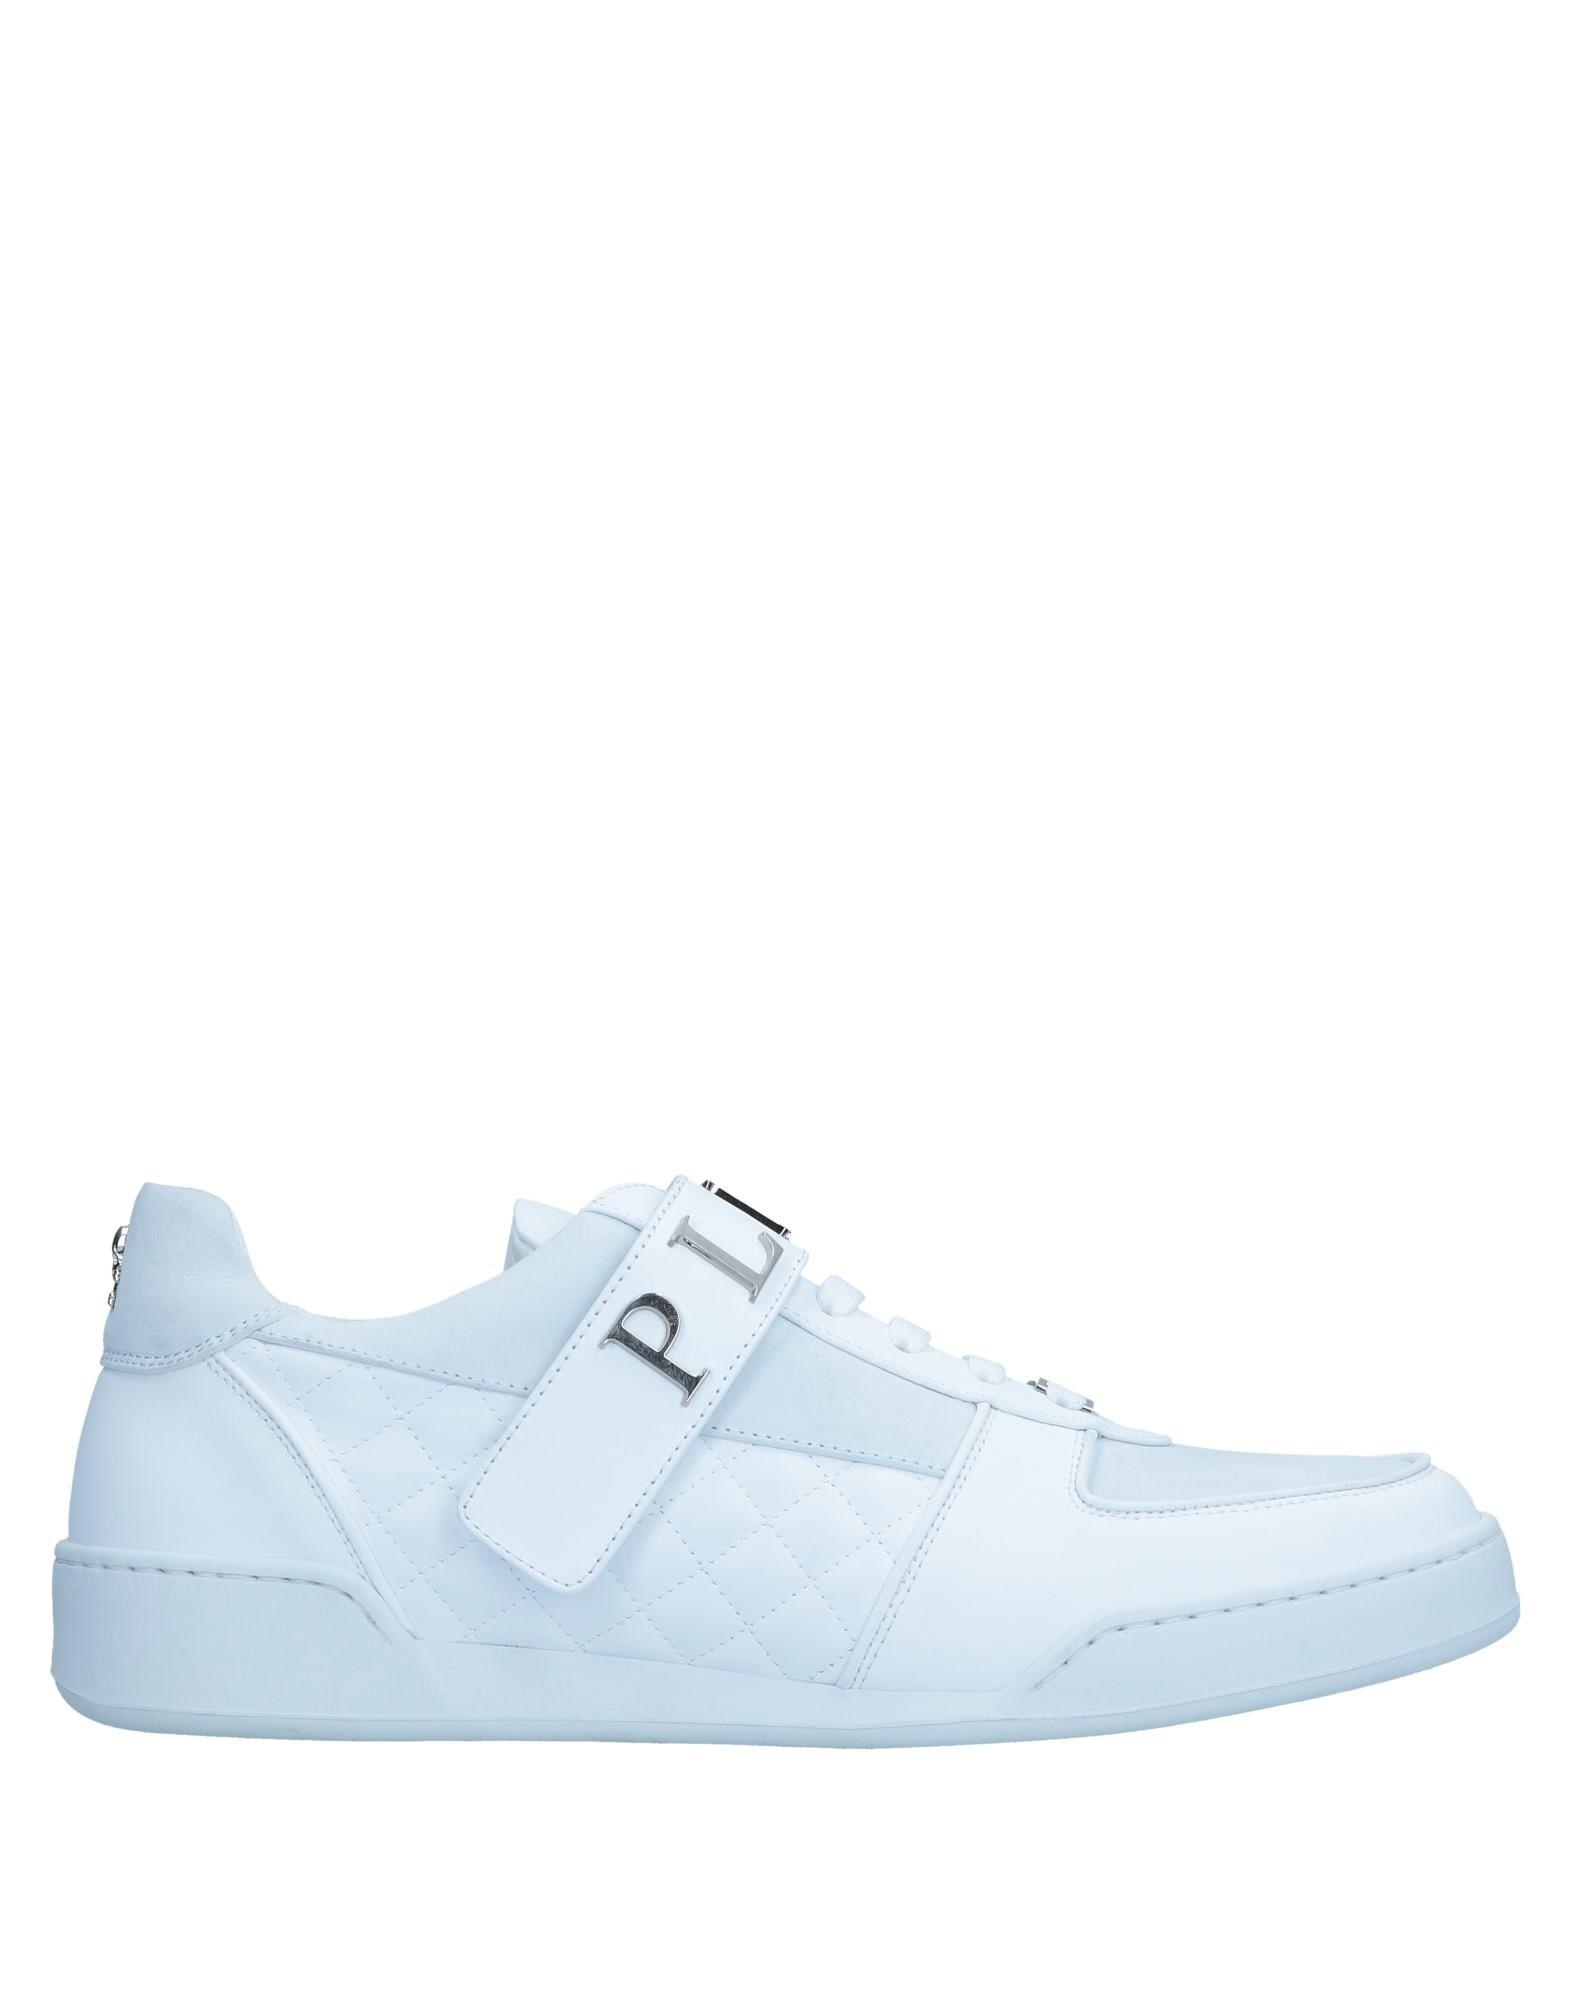 Philipp on Plein Sneakers - Men Philipp Plein Sneakers online on Philipp  Canada - 11511414LS 46c0d1